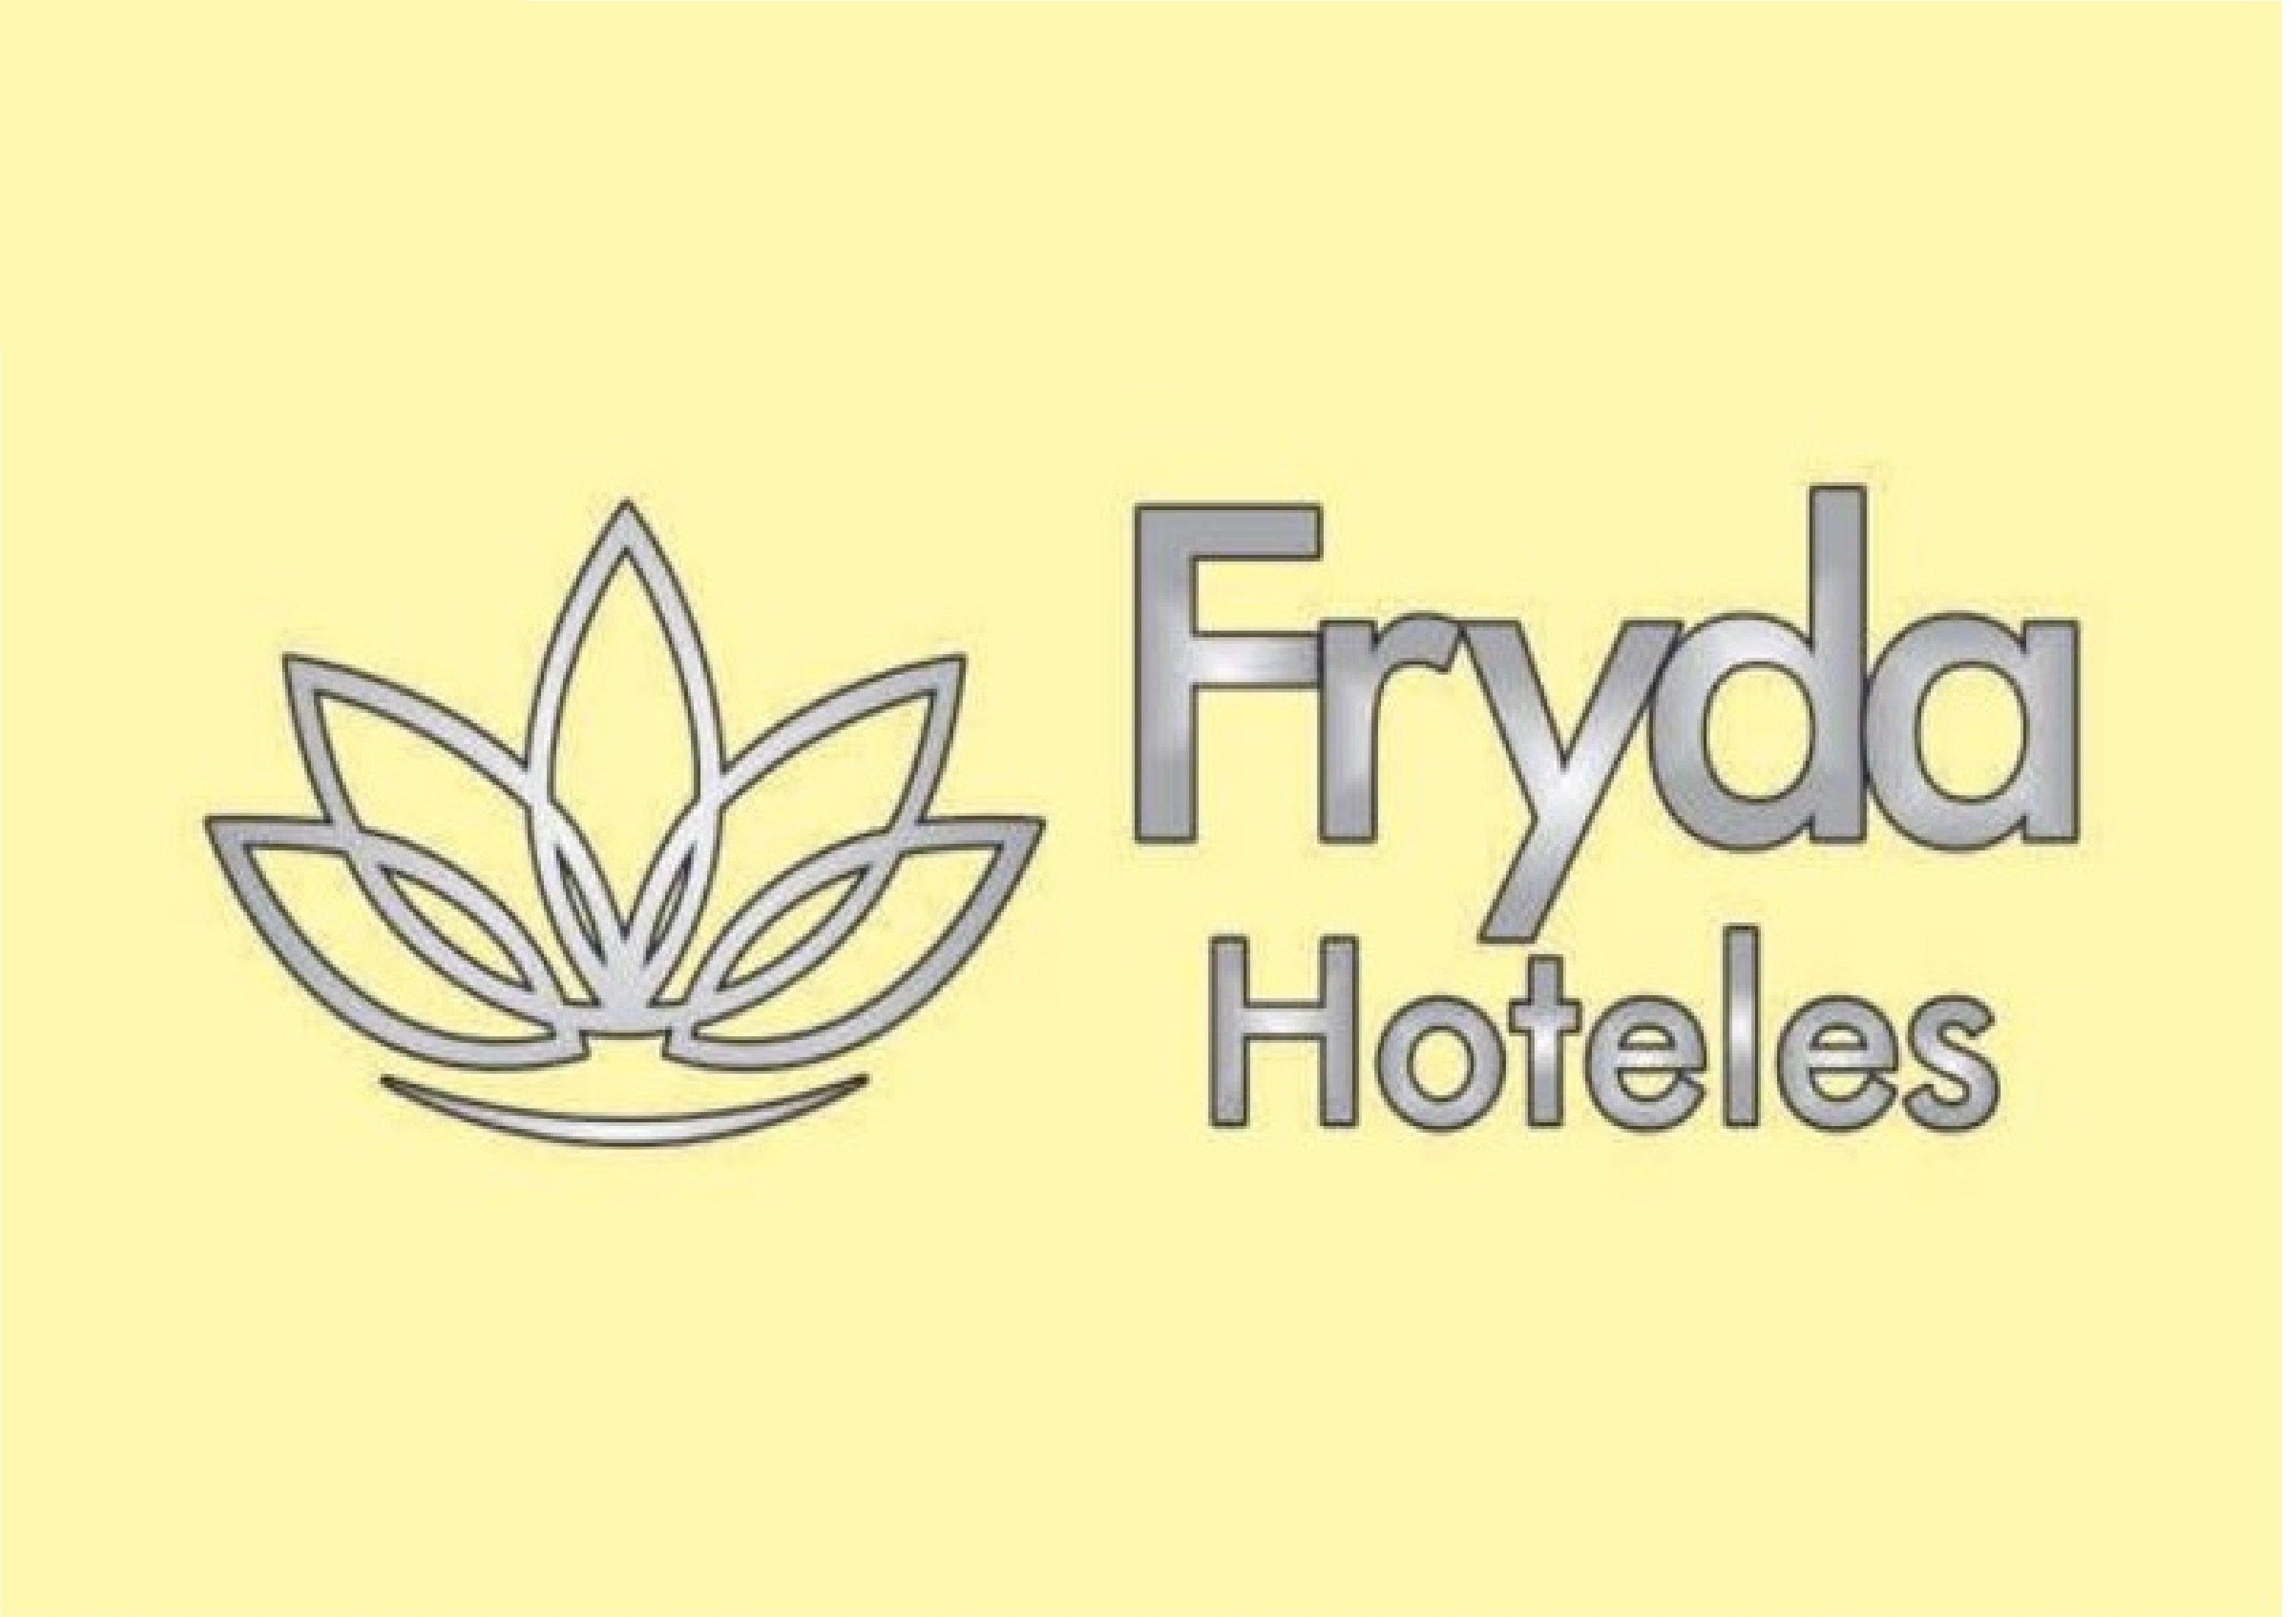 Fryda Hoteles